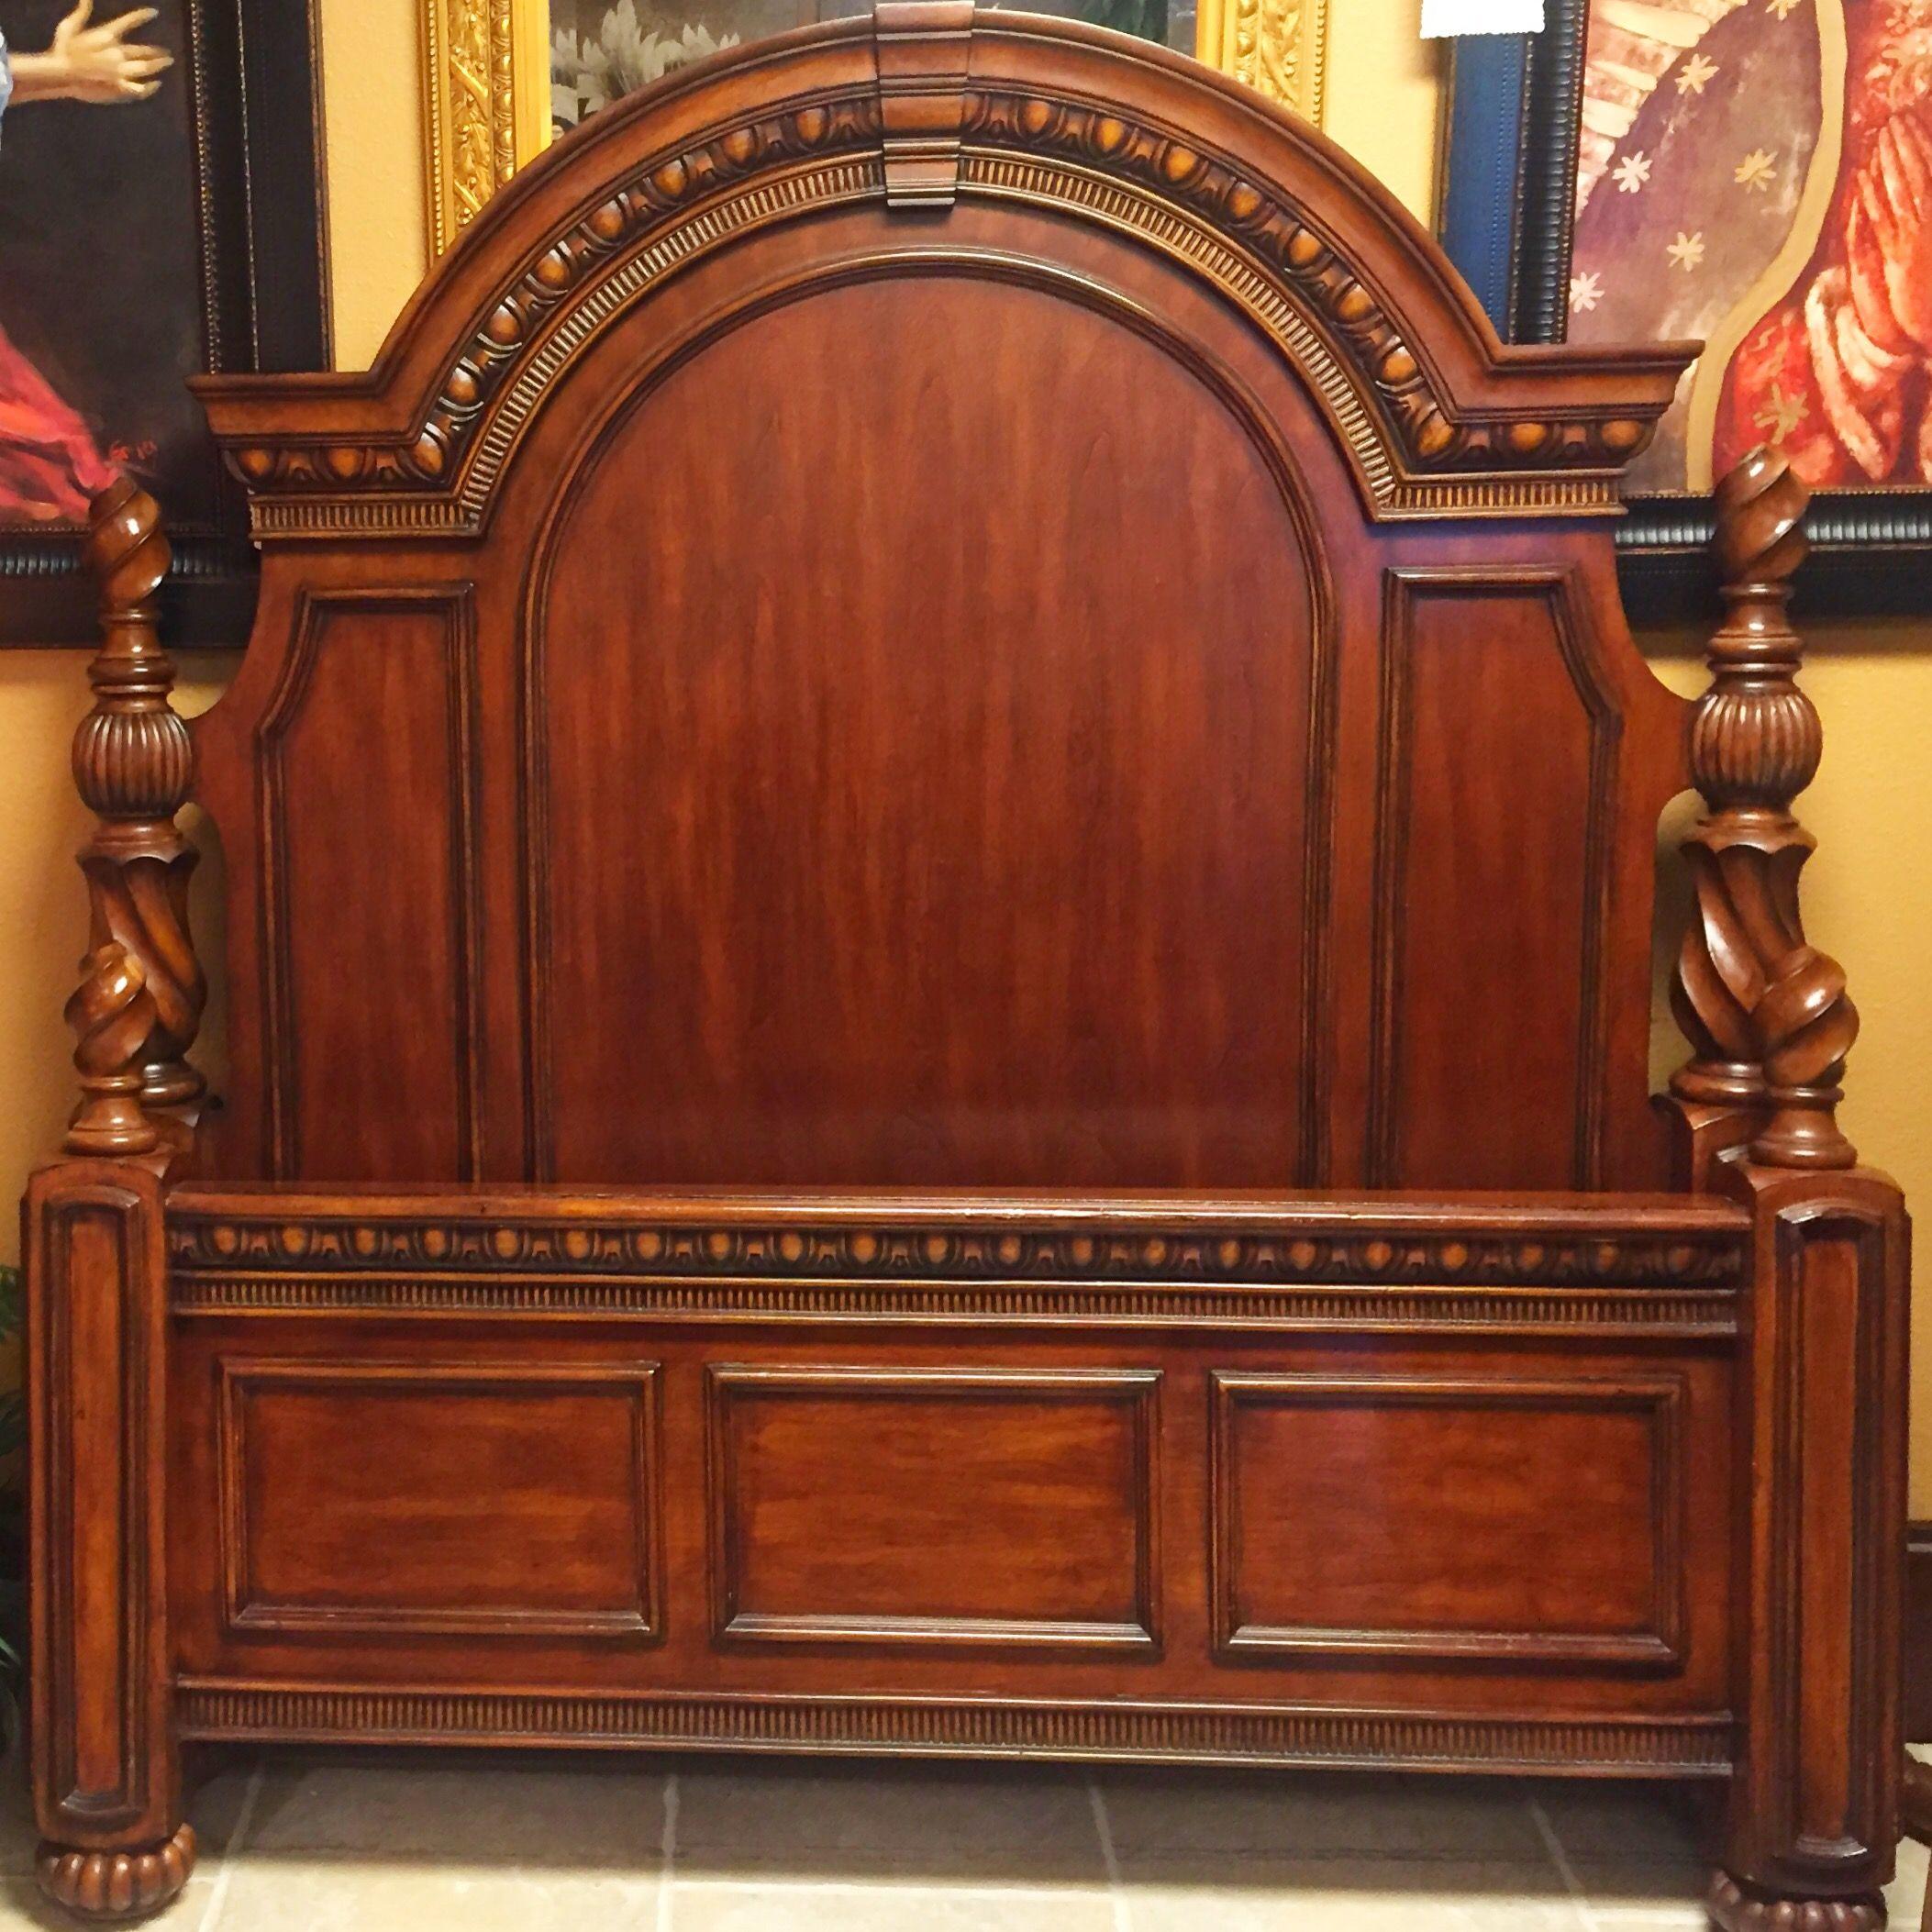 Mahogany bed Mahogany bed, Furniture, Decor